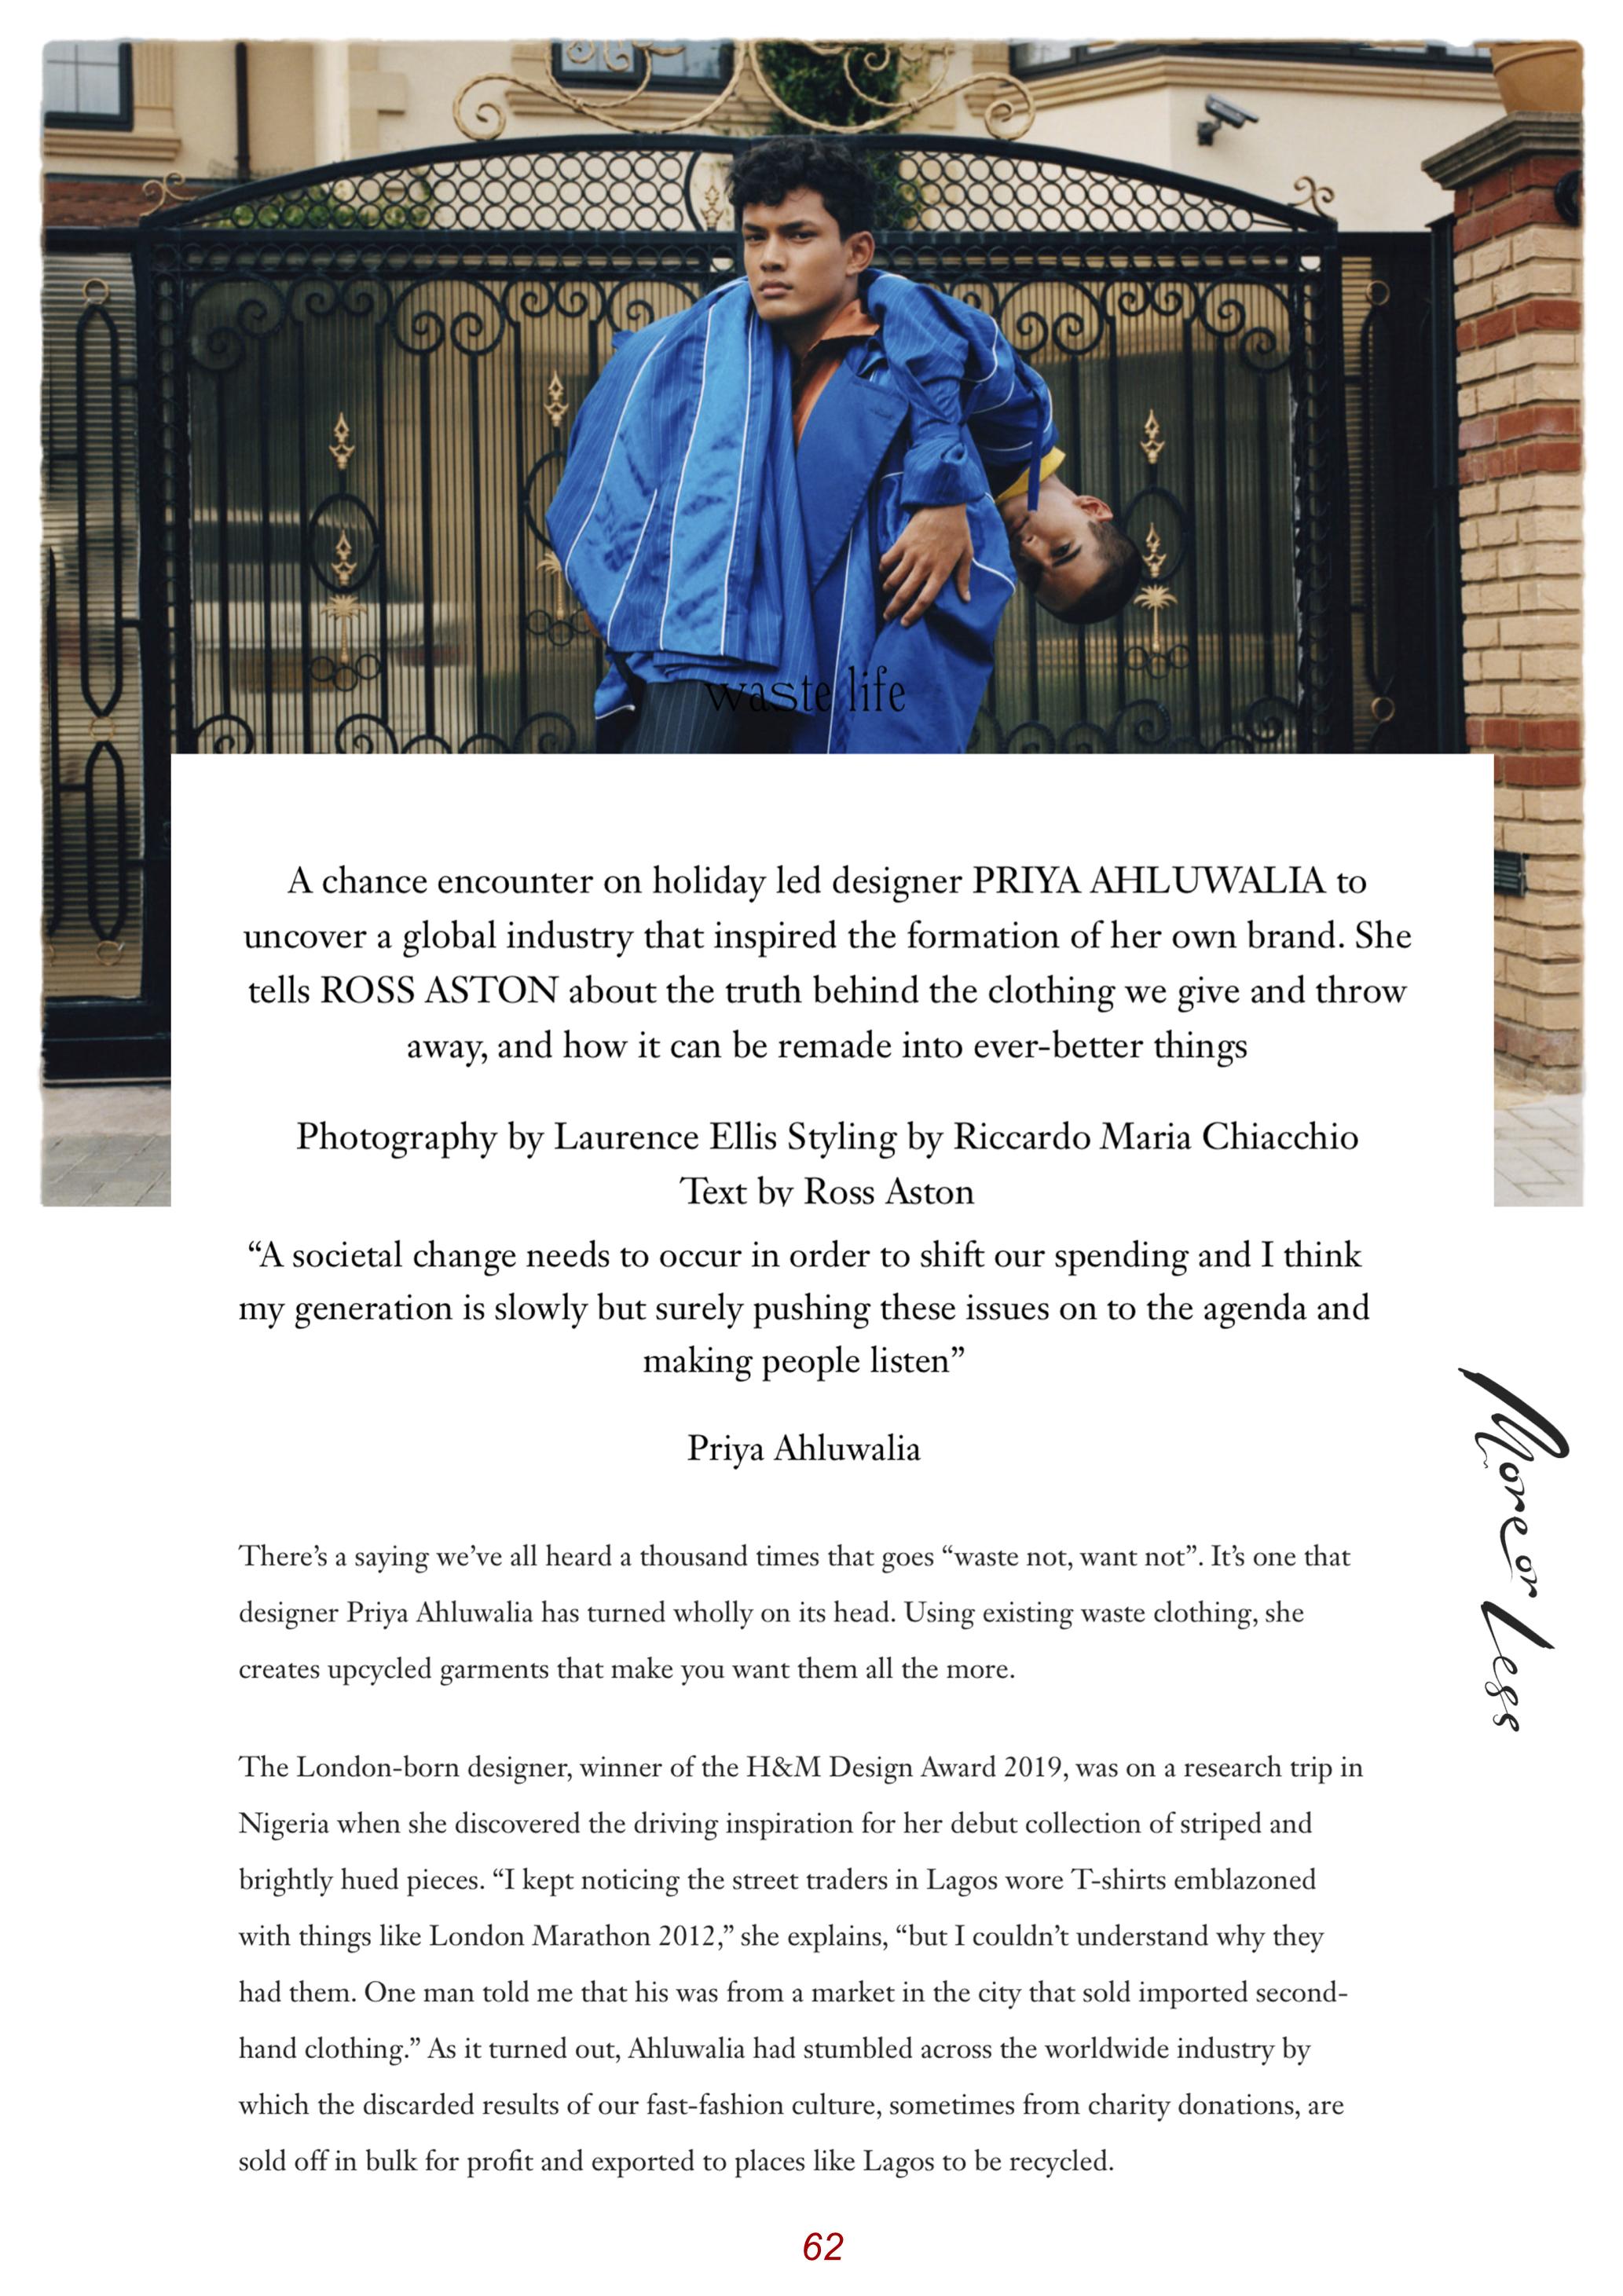 page 62 photo.jpg